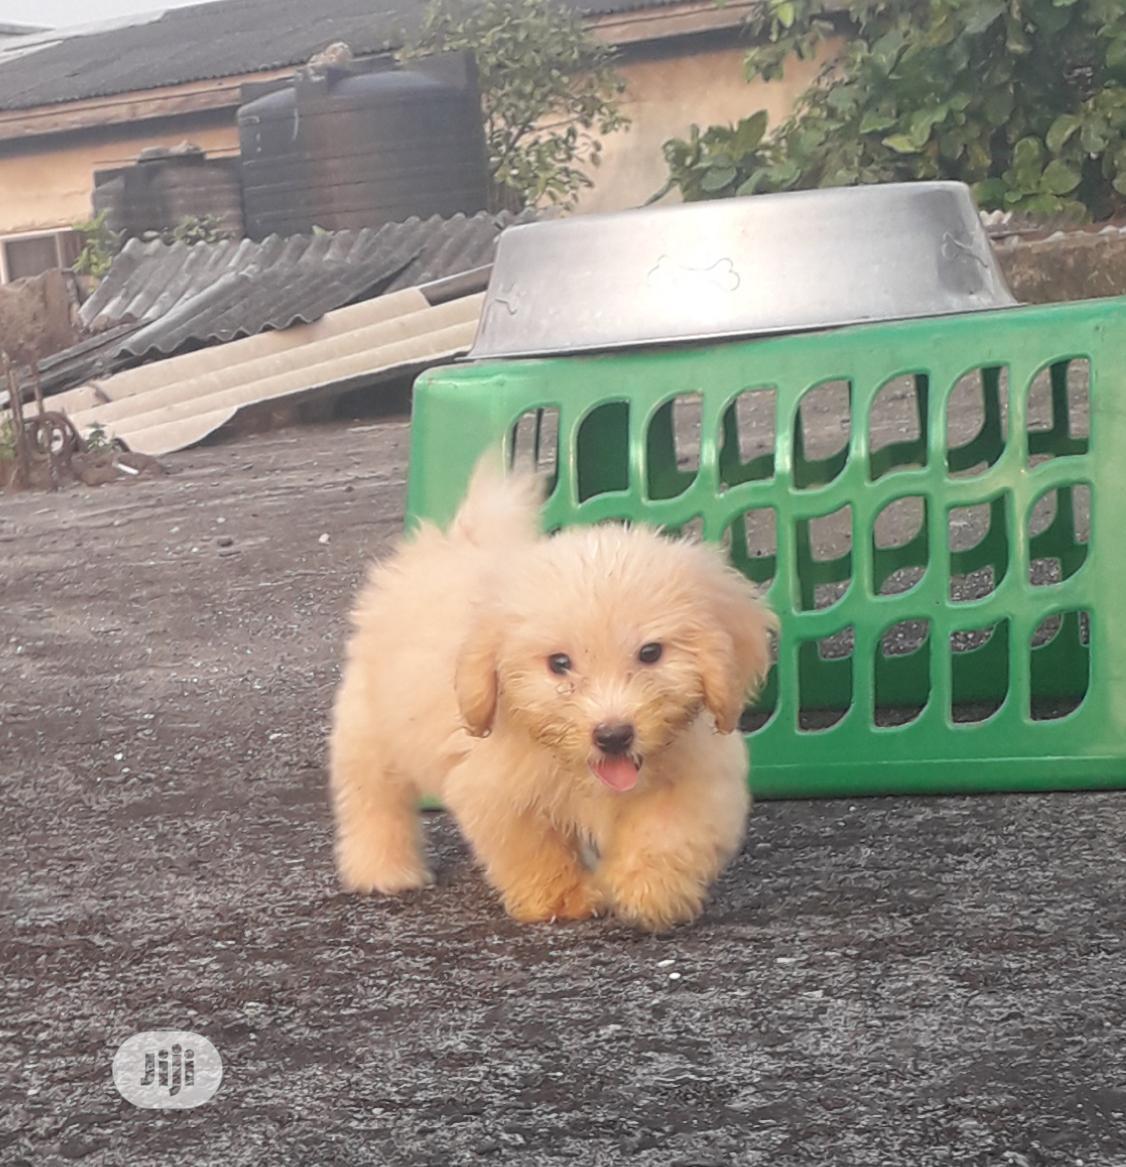 1-3 month Male Purebred Lhasa Apso | Dogs & Puppies for sale in Warri, Delta State, Nigeria